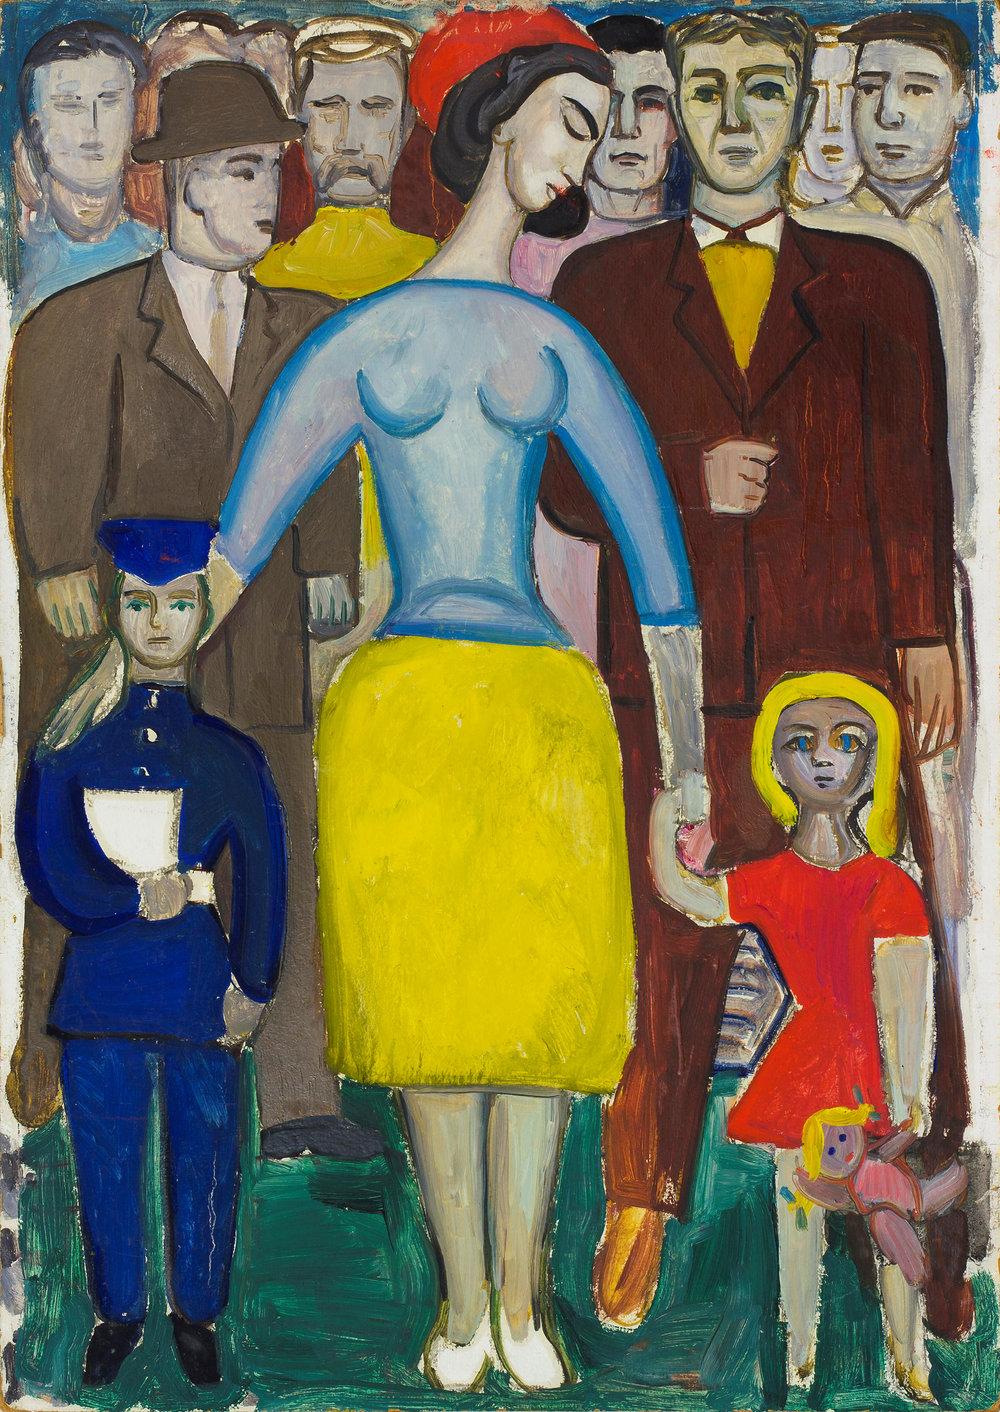 У школу.  Початок 1960-х. Колекція Grynyov Art Foundatiоn